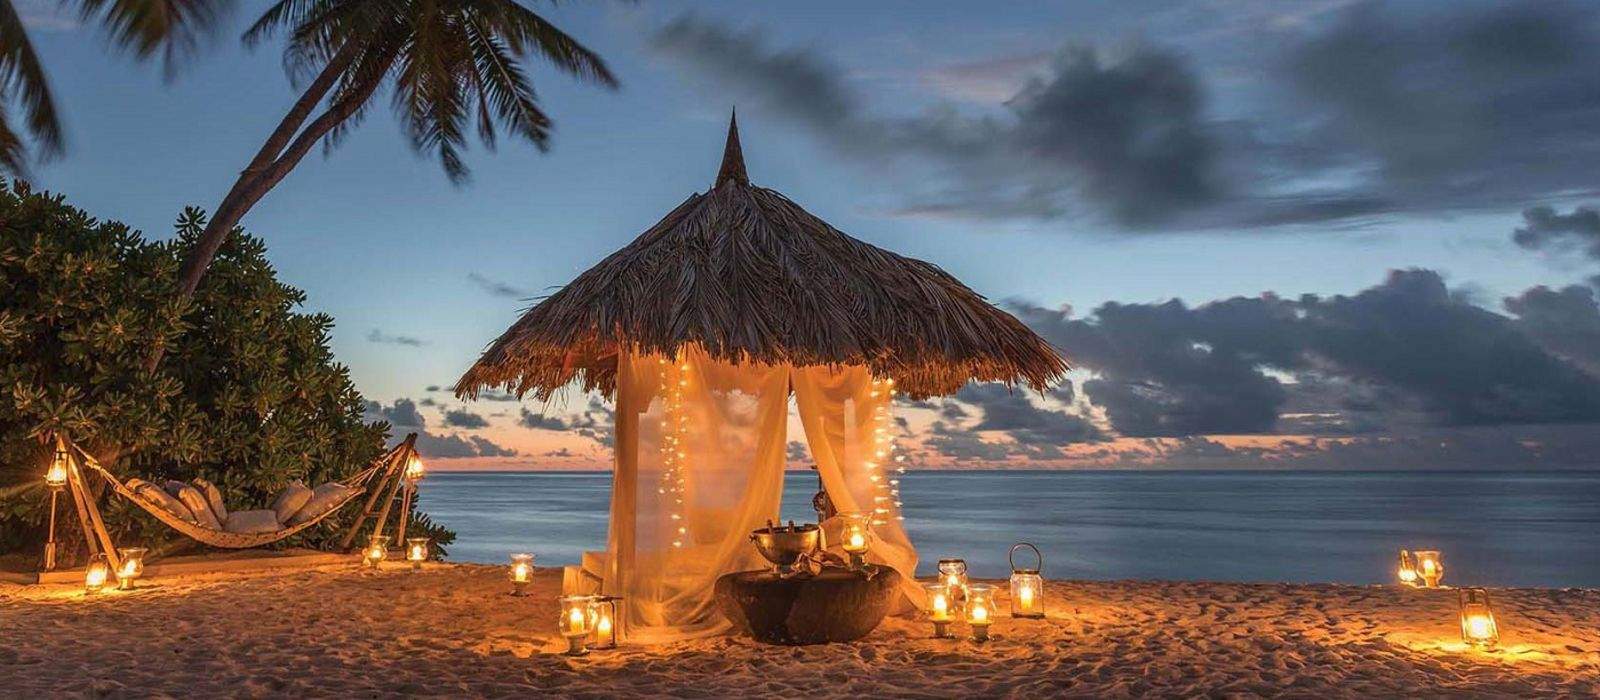 Seychelles Island Paradises Tour Trip 4